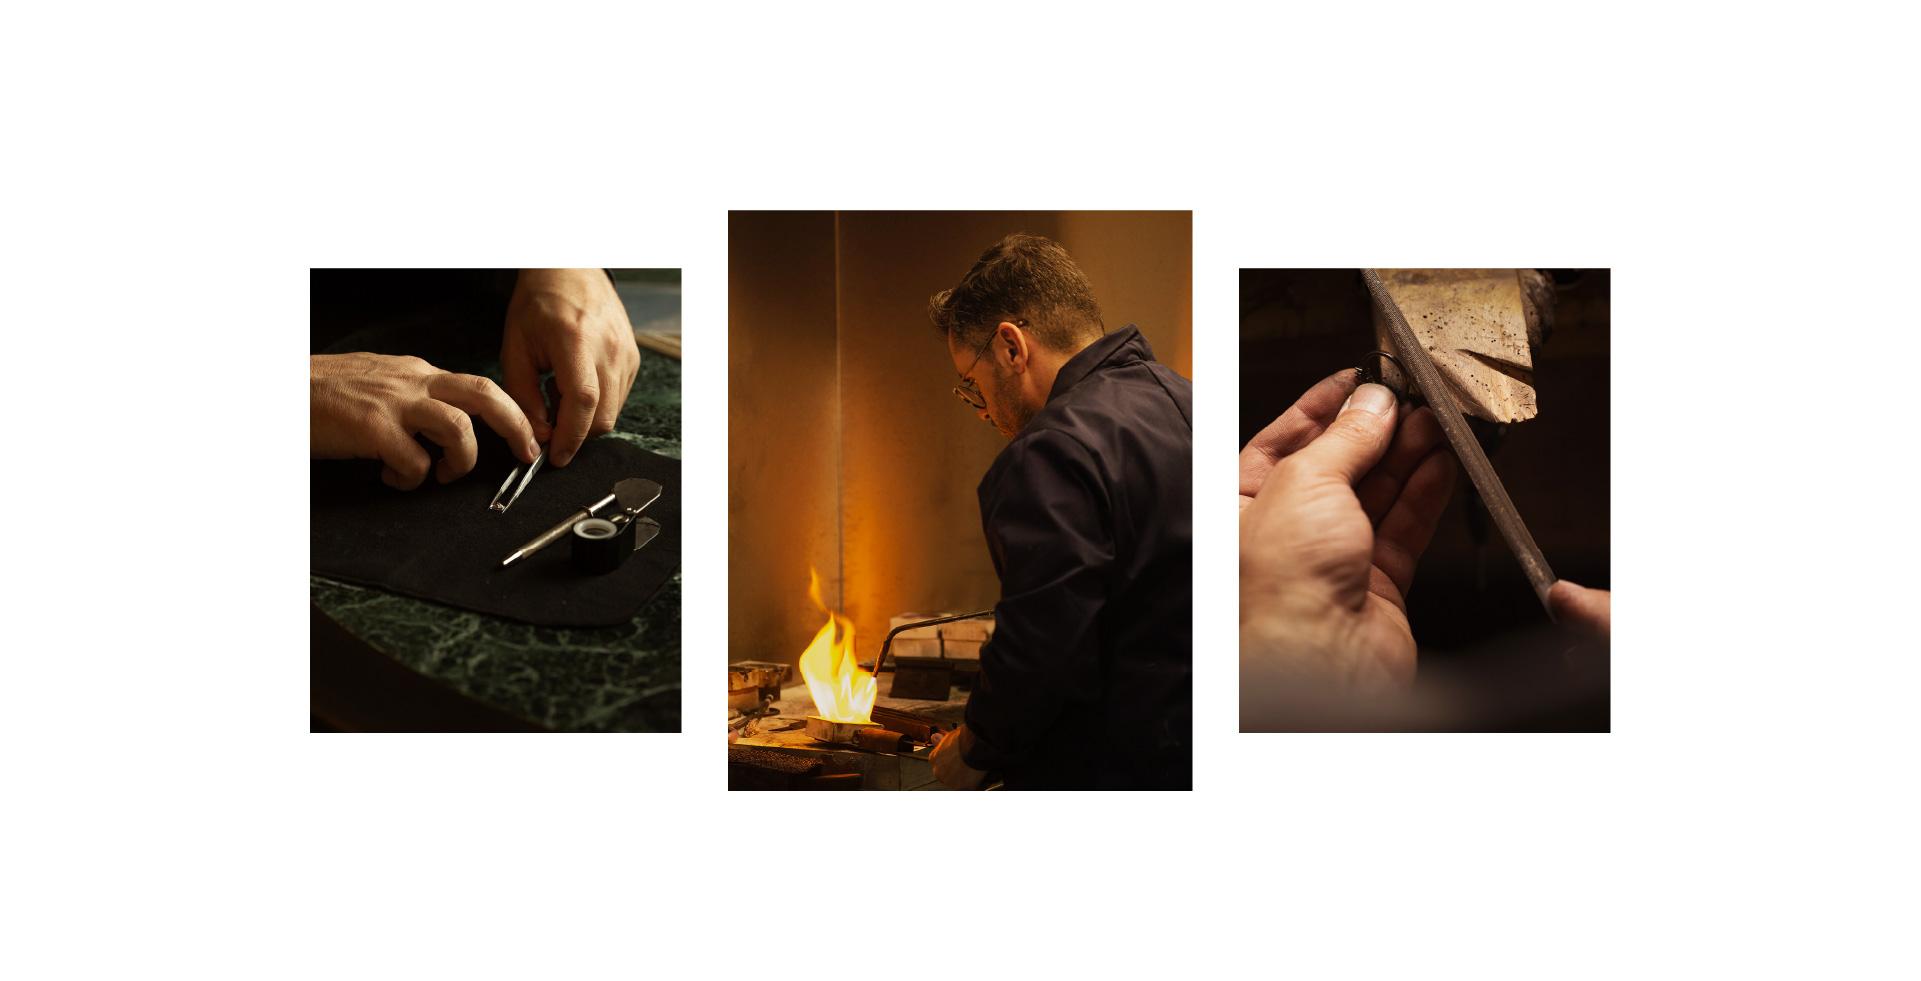 a man crafting jewels